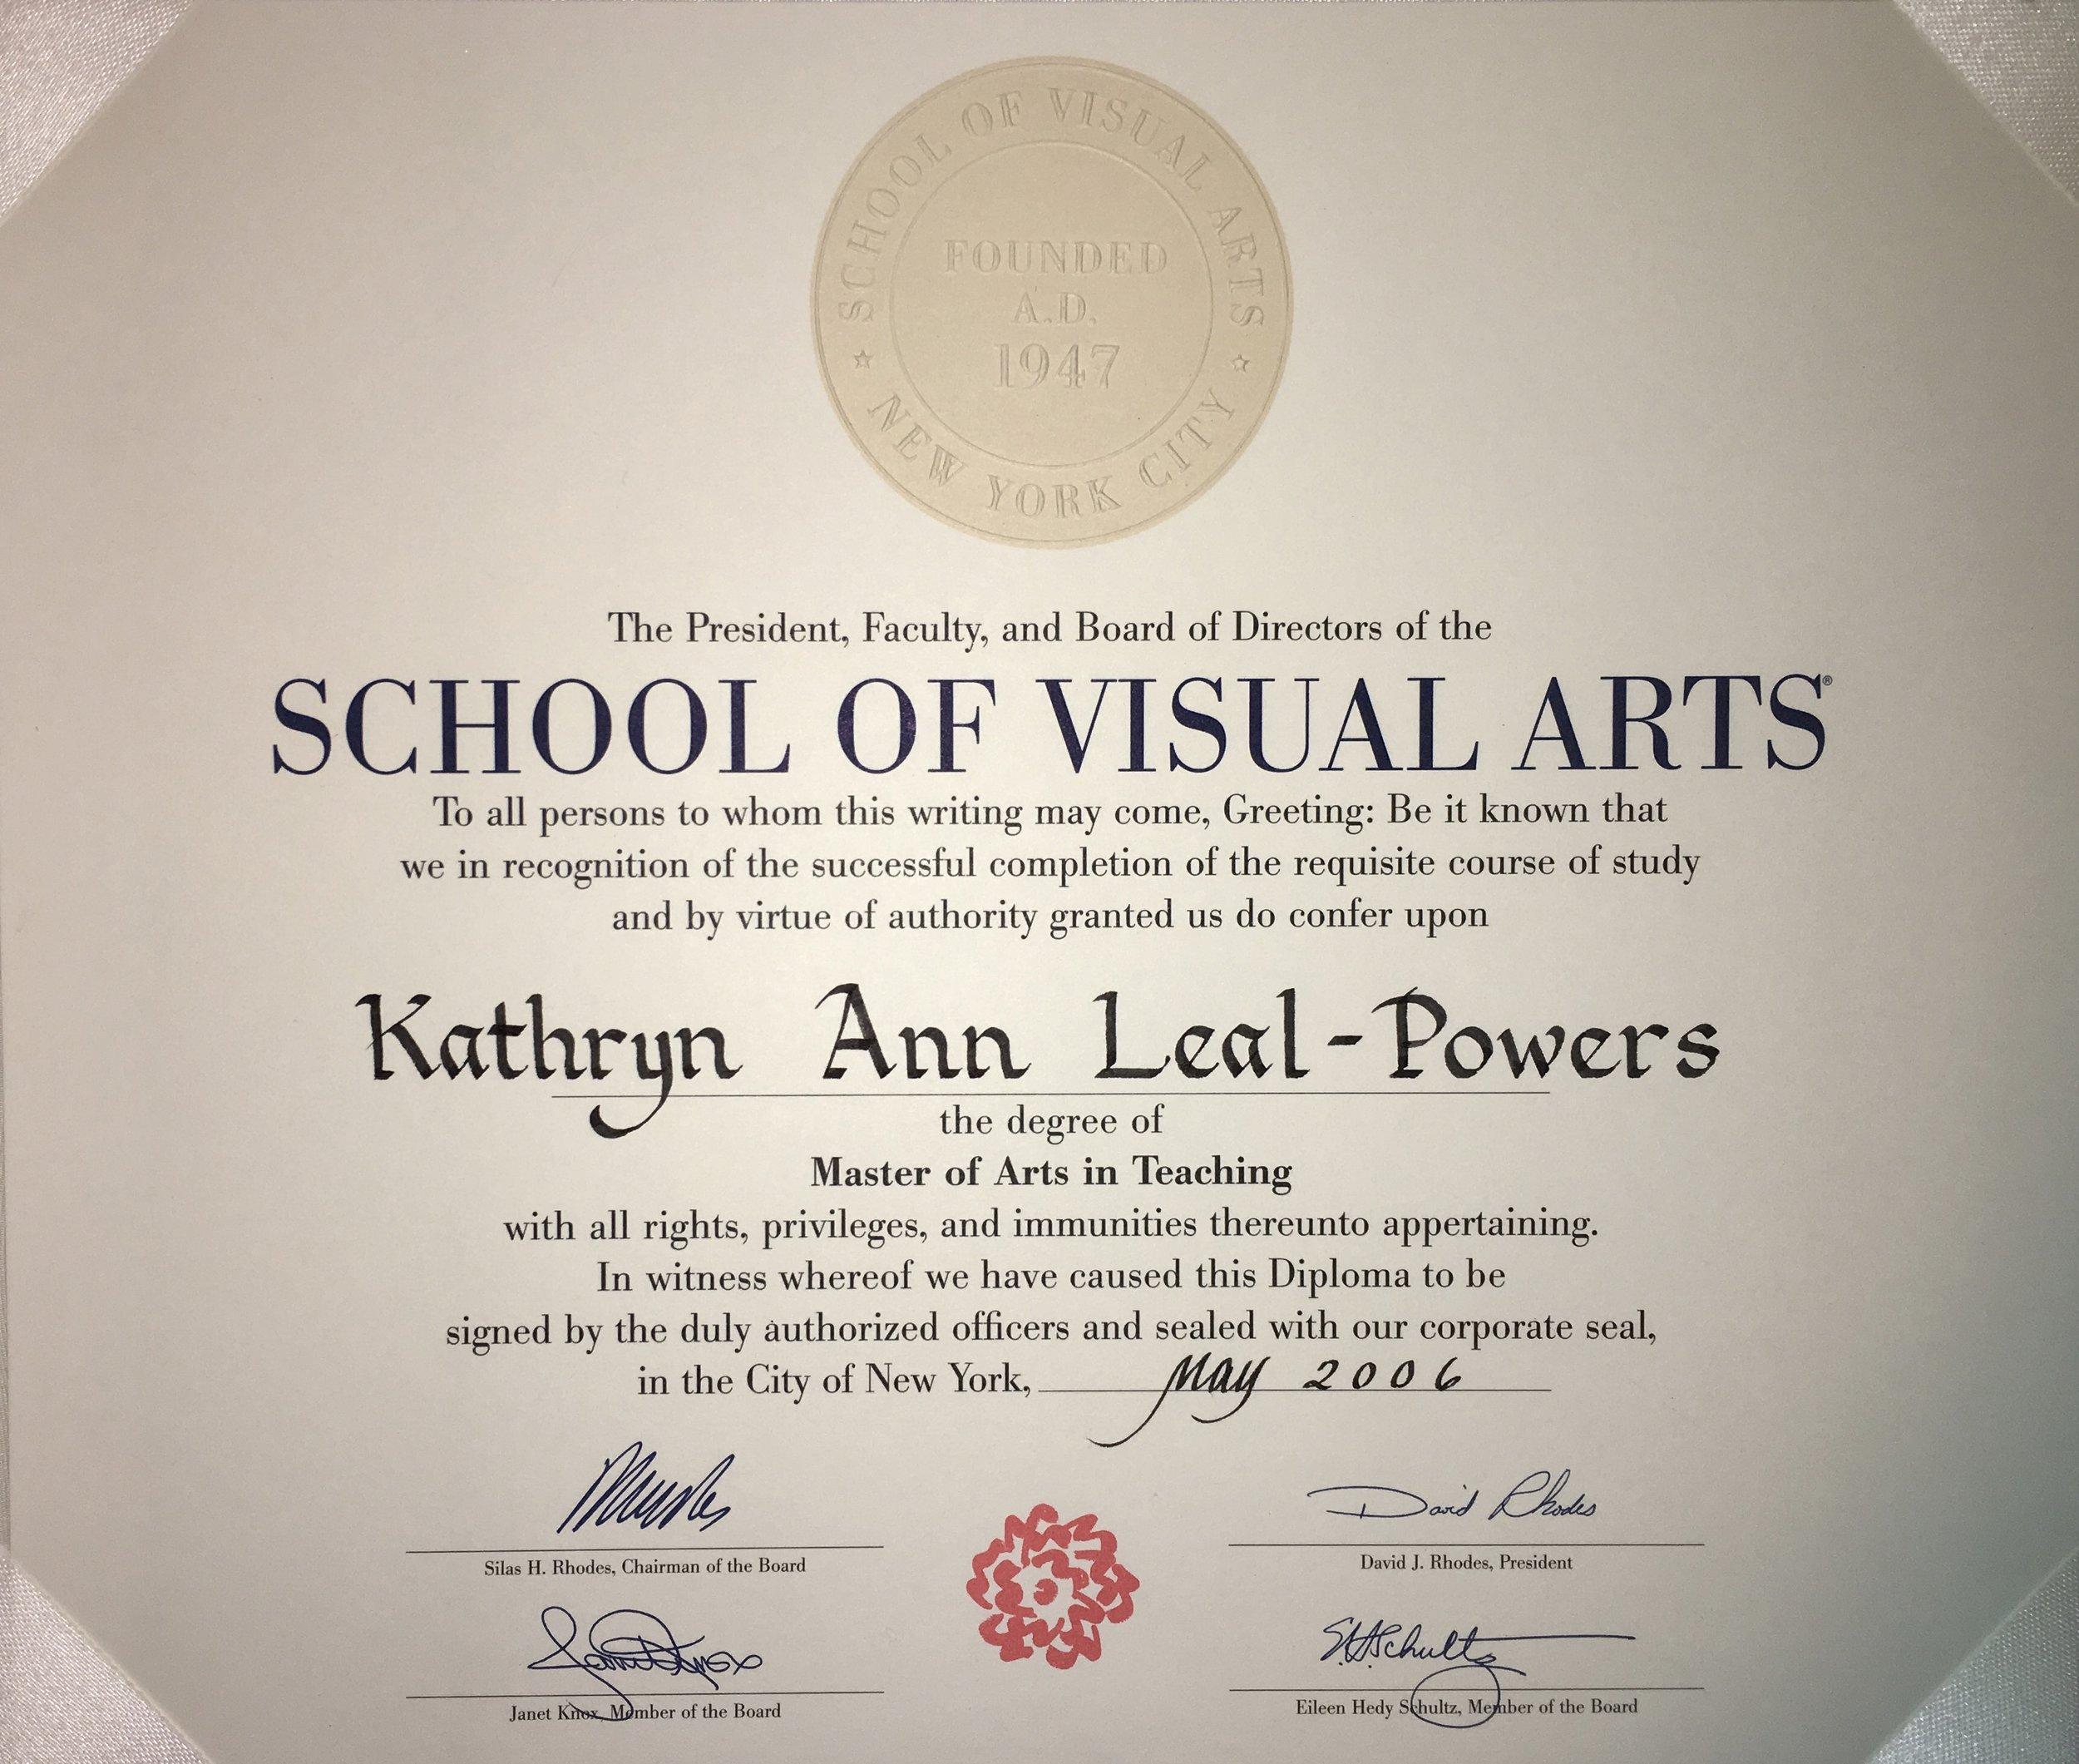 2006 Graduating Class, Master of Arts in Teaching